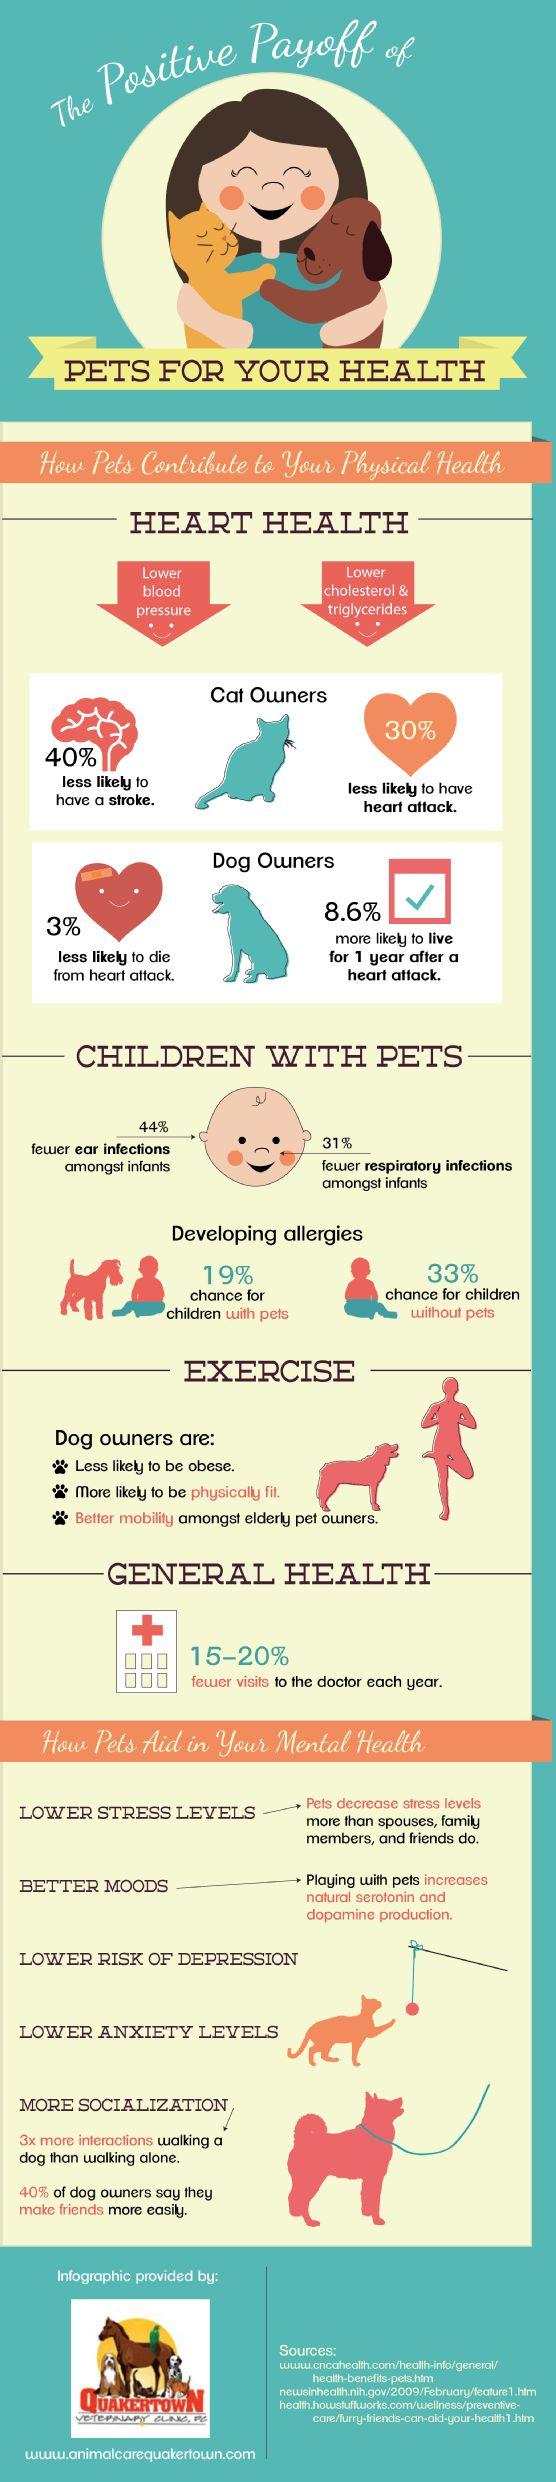 Animals save lives!!!!!!